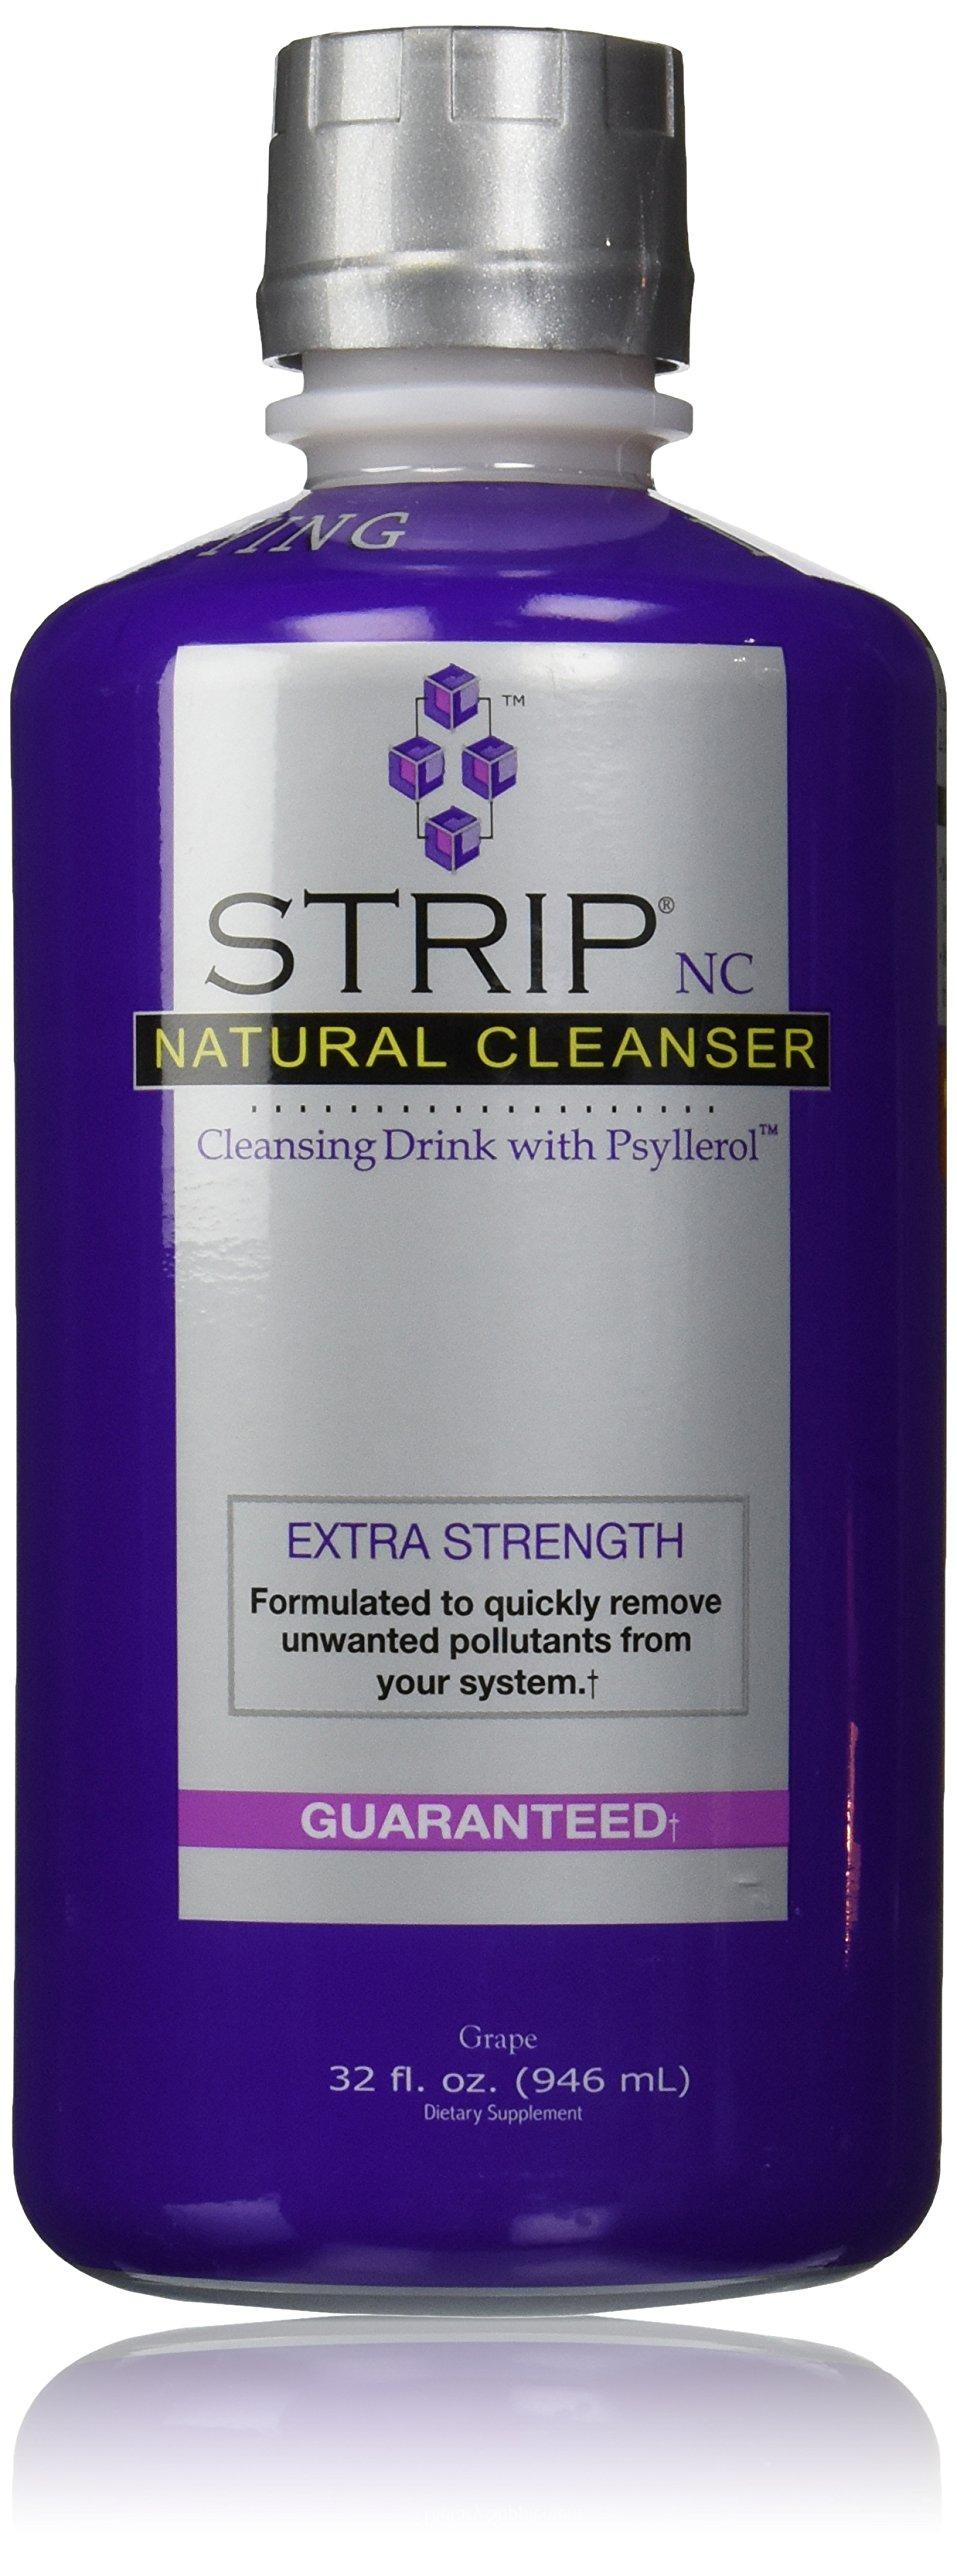 Strip Nc Natural Cleanser Extra Strengh Grape 32 Fl Oz 20